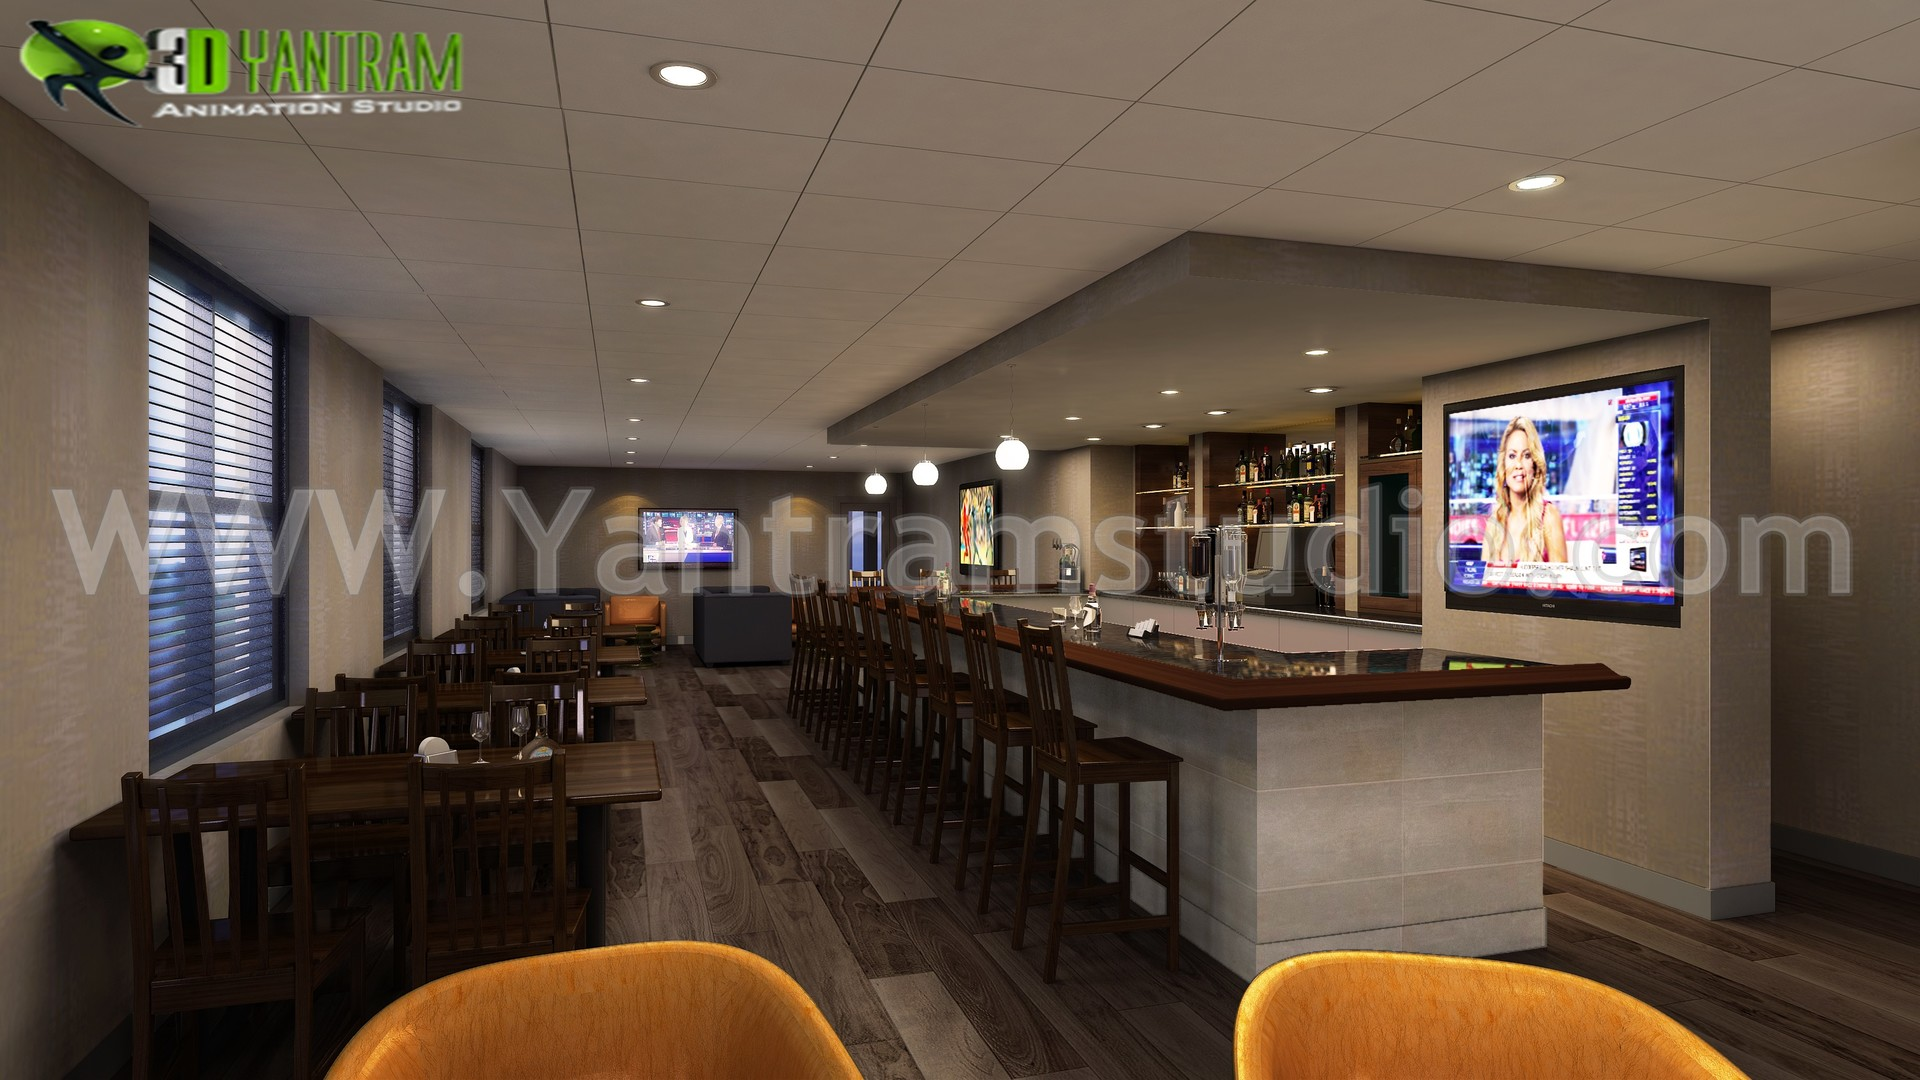 Artstation Lounge Bar Restaurant Design By Yantram 3d Interior Designers Melbourne Australia Yantram Architectural Design Studio